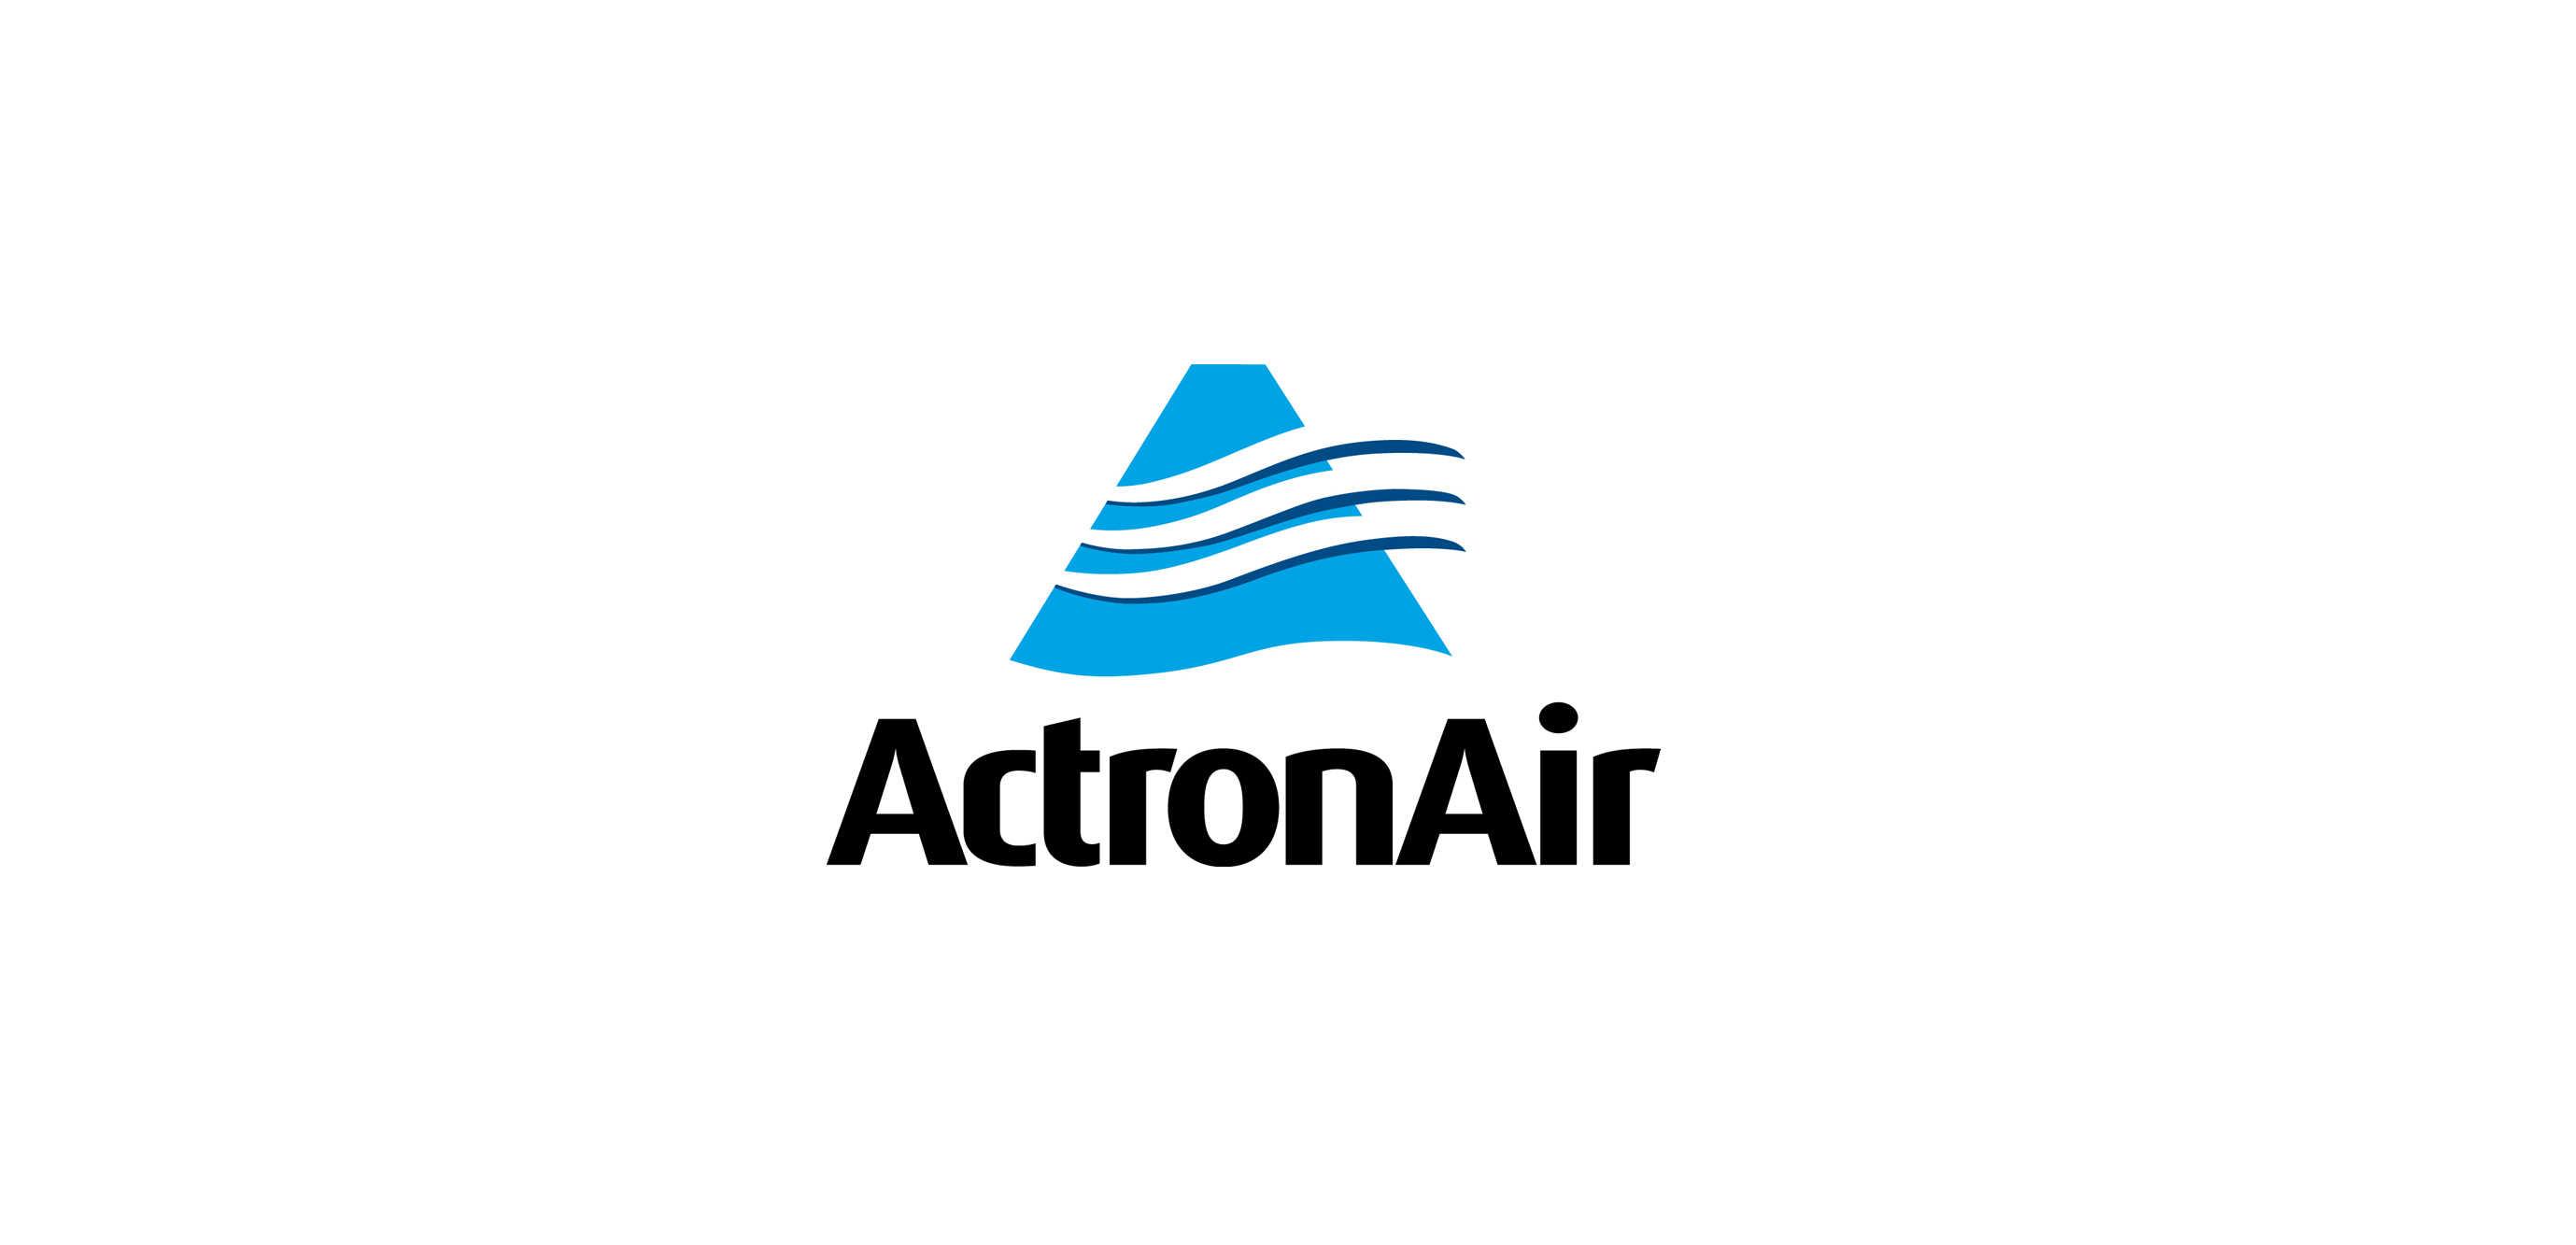 Logo Actron Air Png - Logo Actron Air Png Hdpng.com 2758, Transparent background PNG HD thumbnail